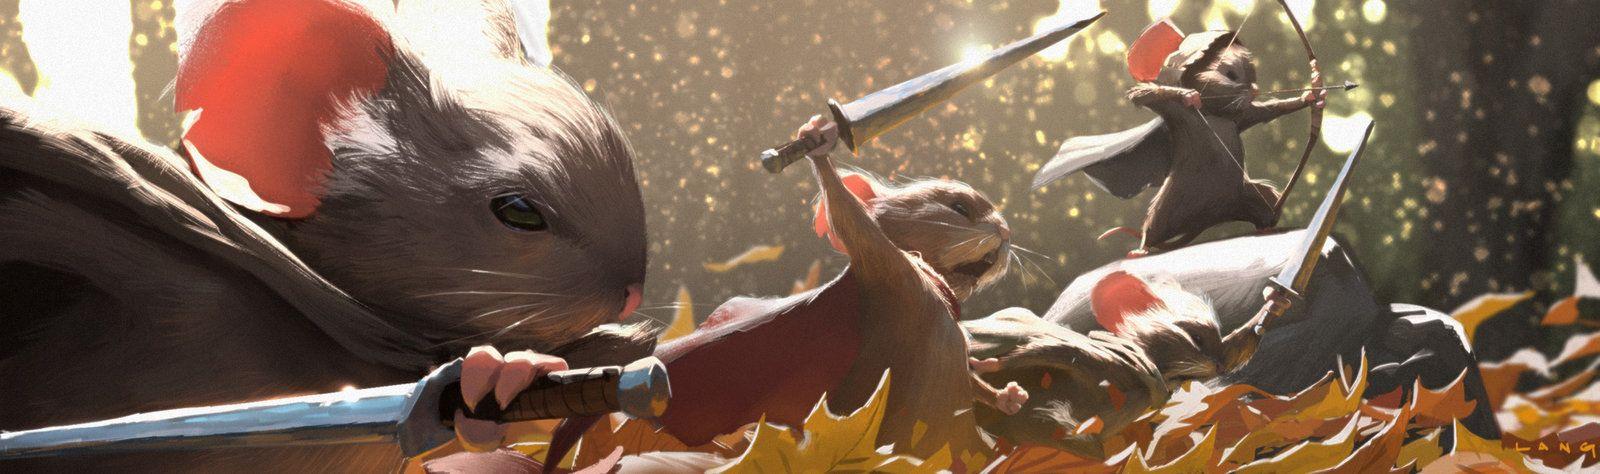 Mouse Guard: Legends of the Guard #4 panel, ryan  lang on ArtStation at https://www.artstation.com/artwork/mouse-guard-legends-of-the-guard-4-panel